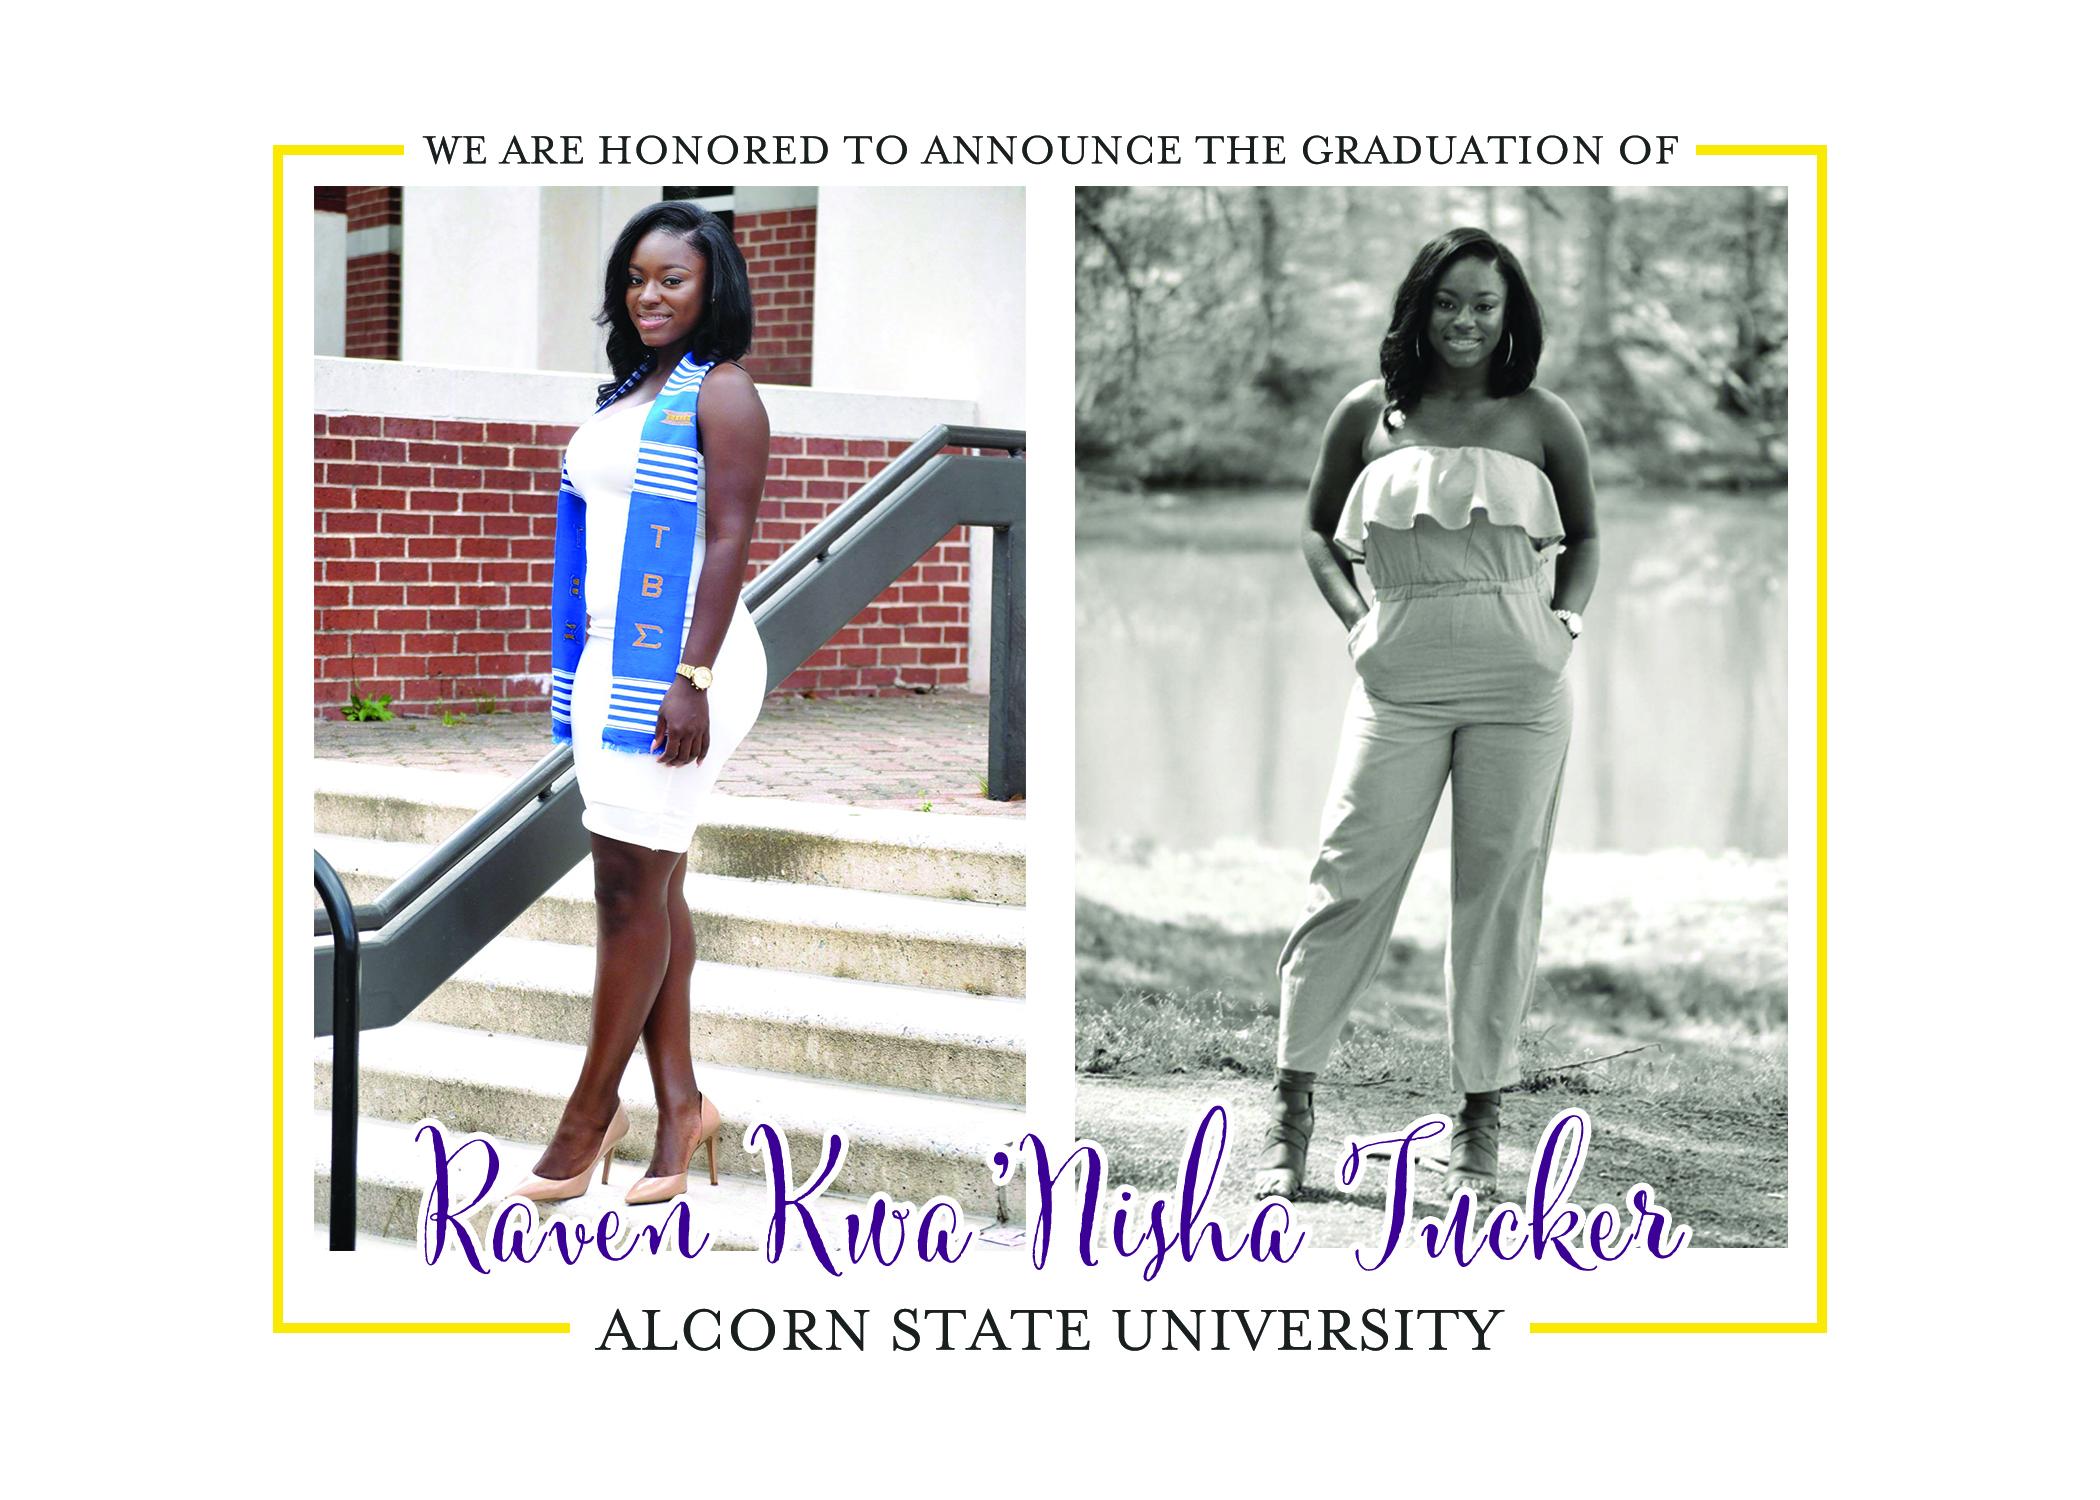 graduation announcement side 1.jpg